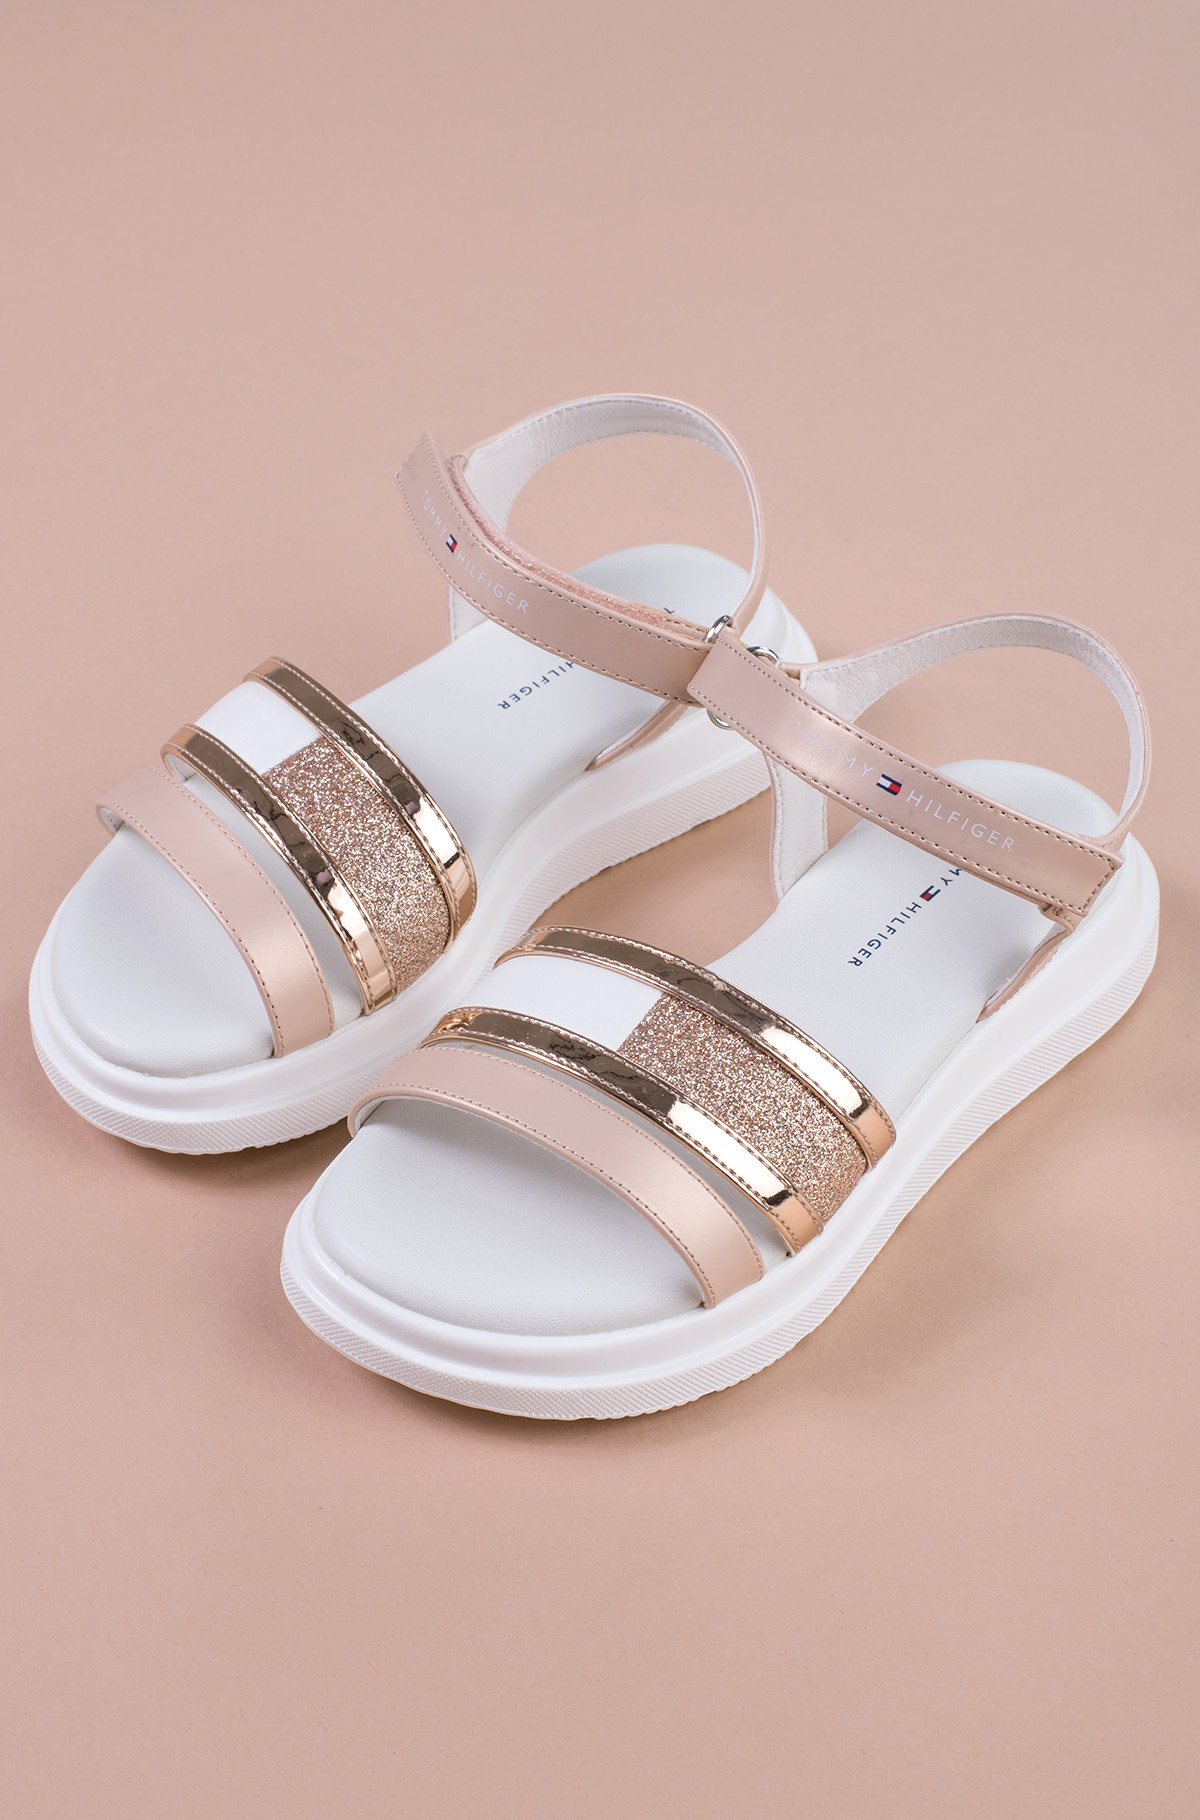 Sandals T3A2-31038-1160341-full-3